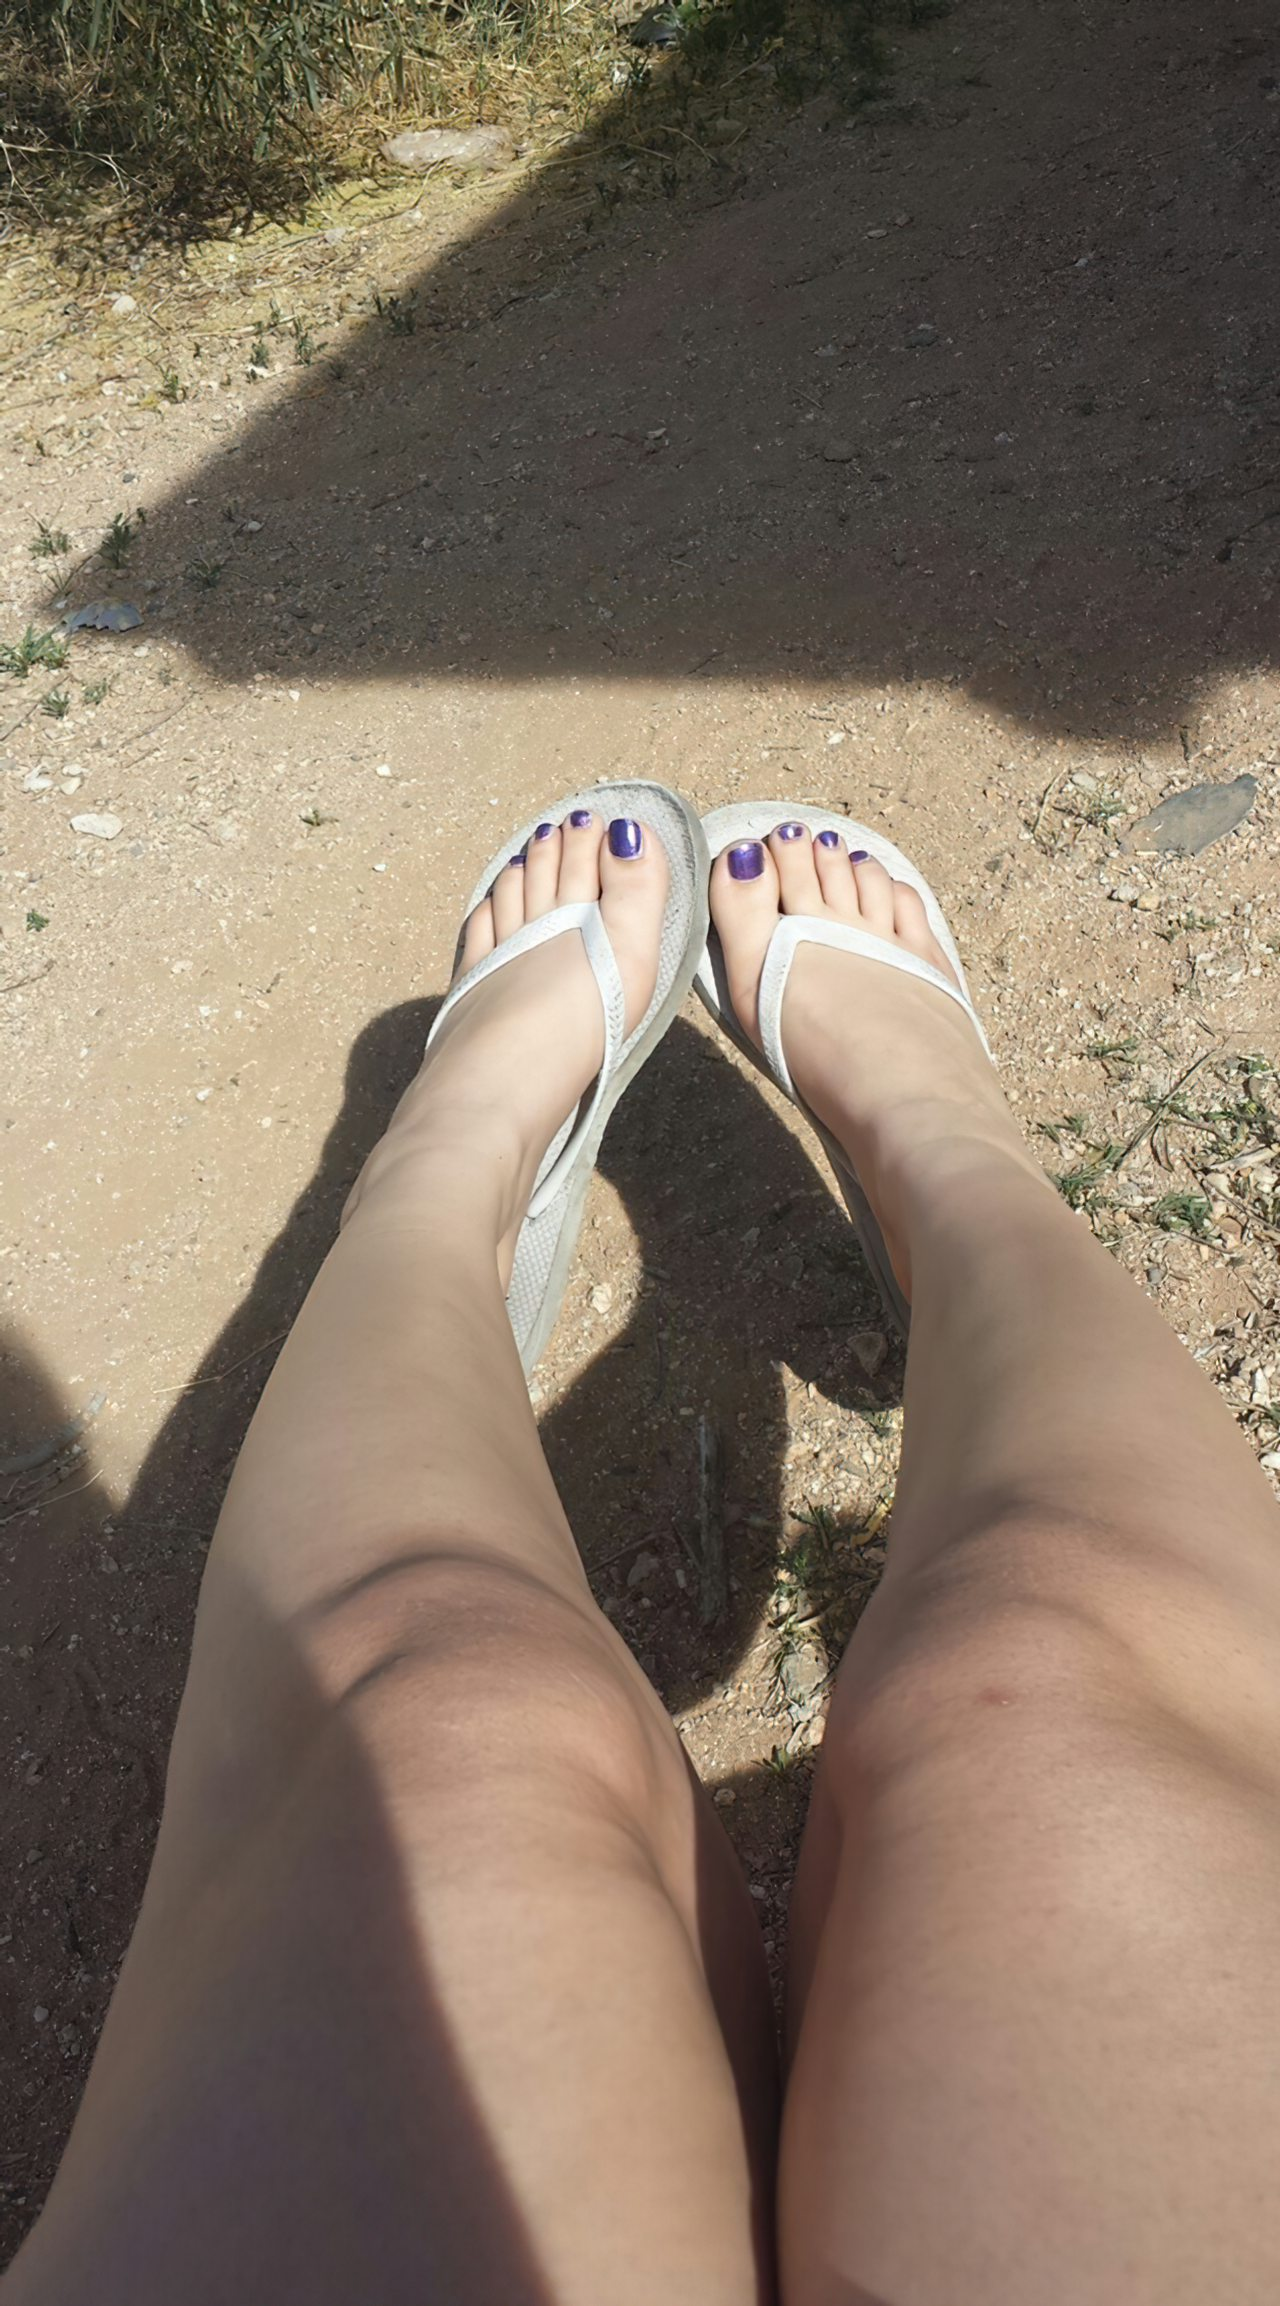 Amadora Pelada num Dia de Sol (2)